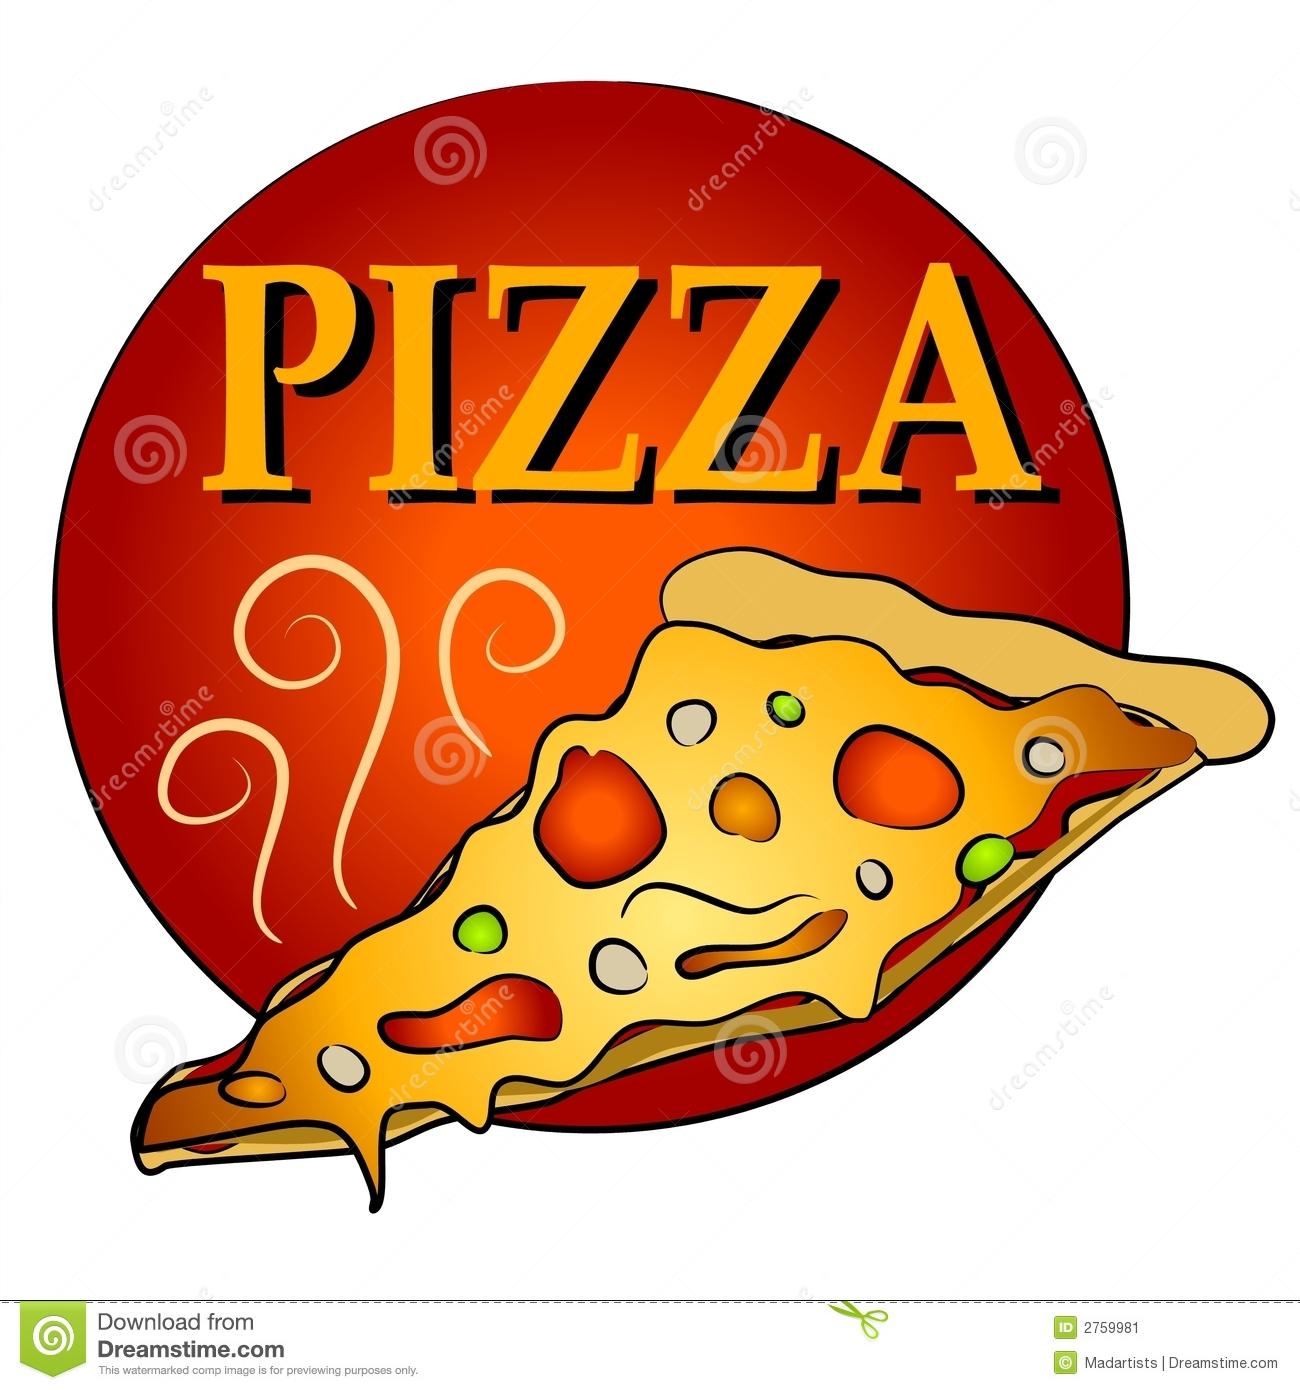 Hot Slice of Pizza Clipart stock illustration. Illustration of junk.